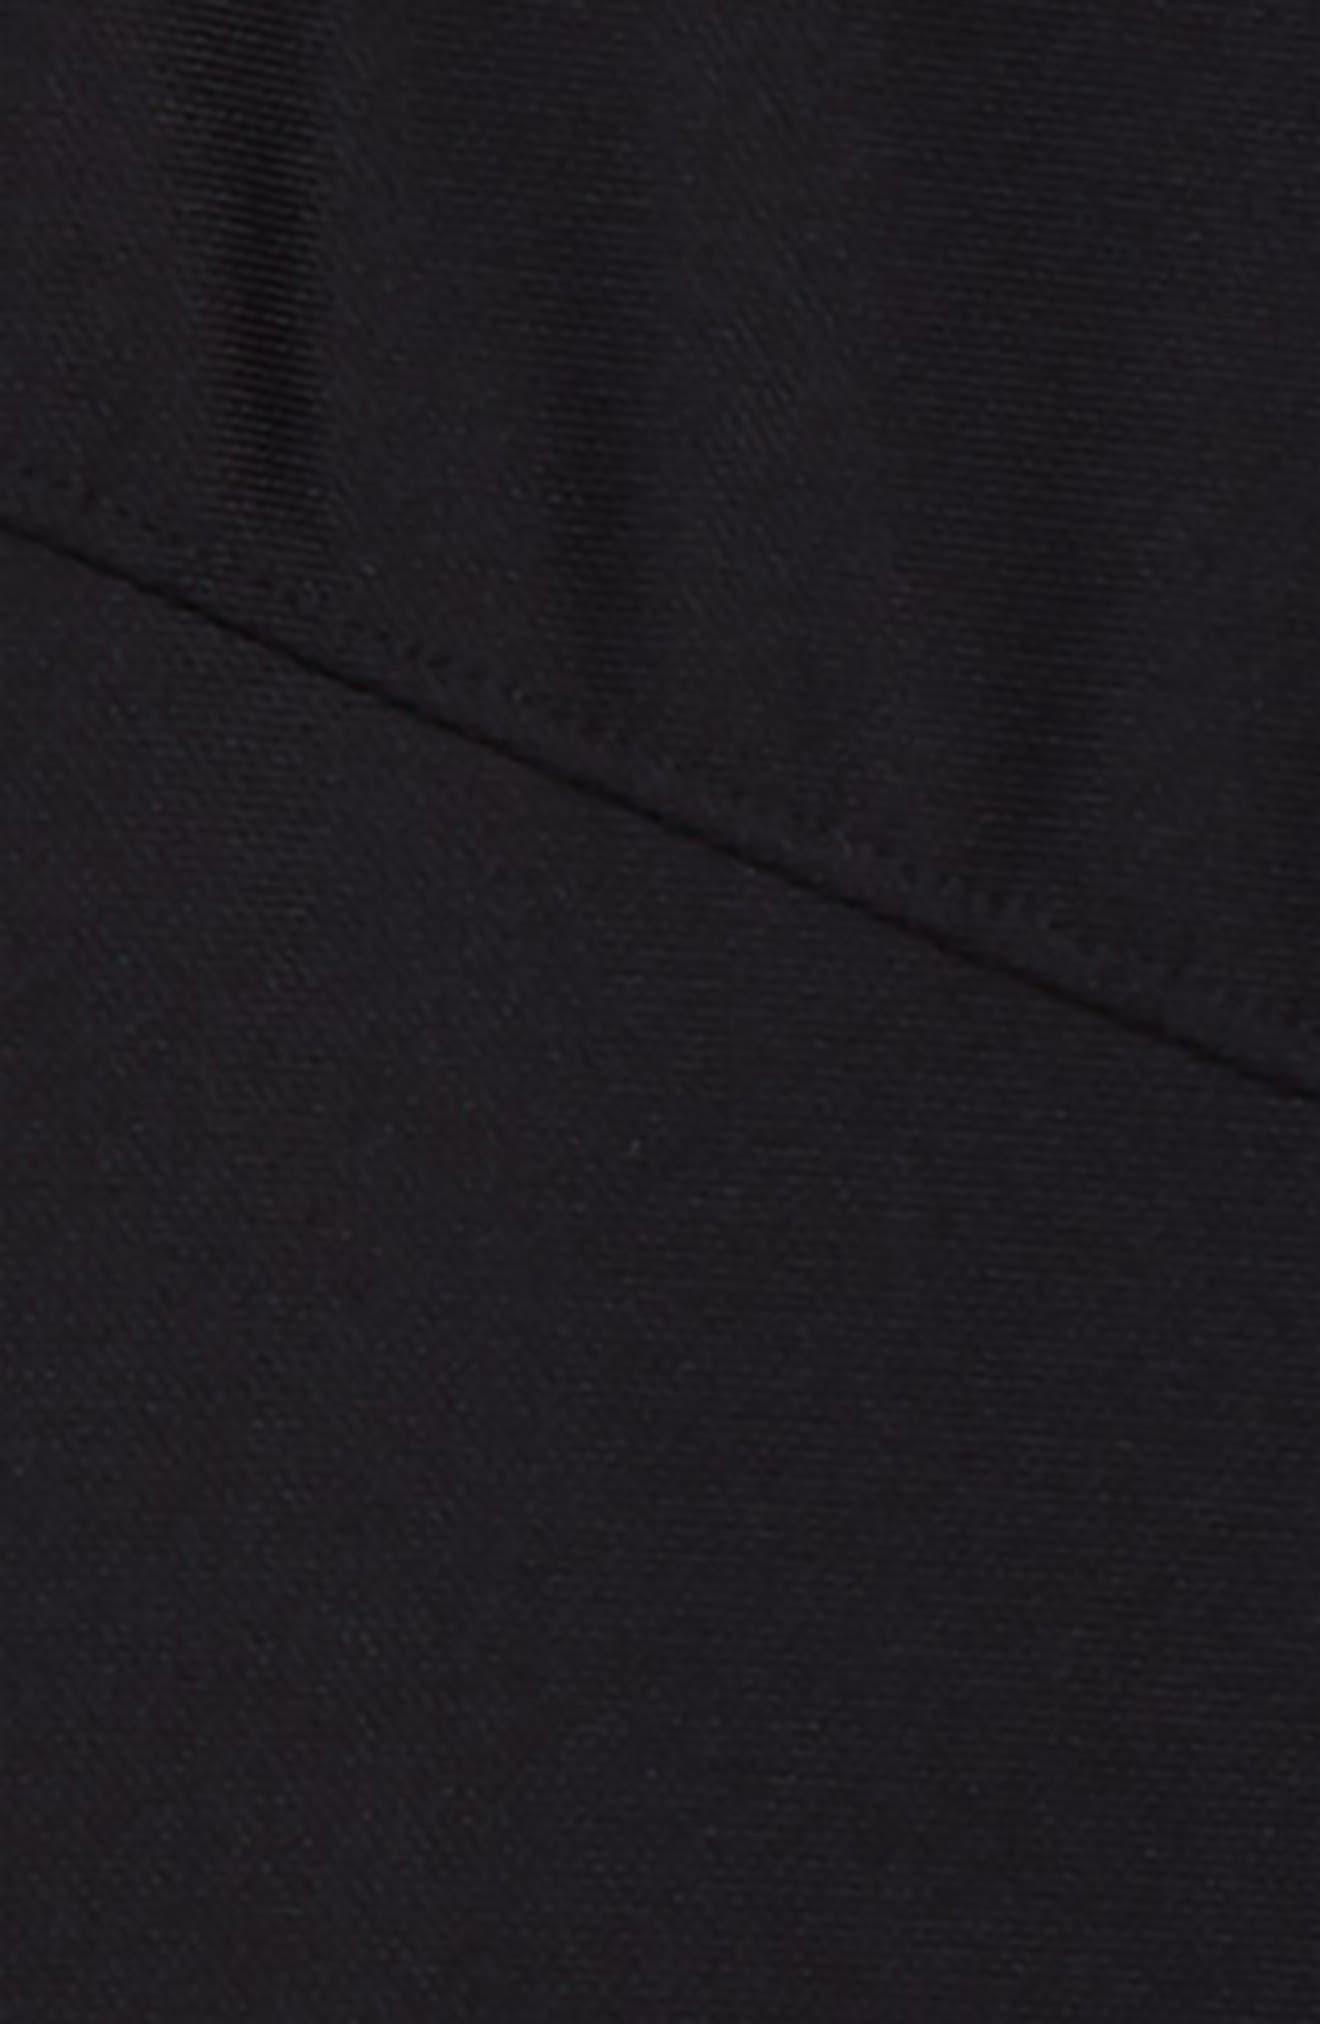 UNDER ARMOUR, Prototype HeatGear<sup>®</sup> Pants, Alternate thumbnail 2, color, BLACK/ PITCH GRAY